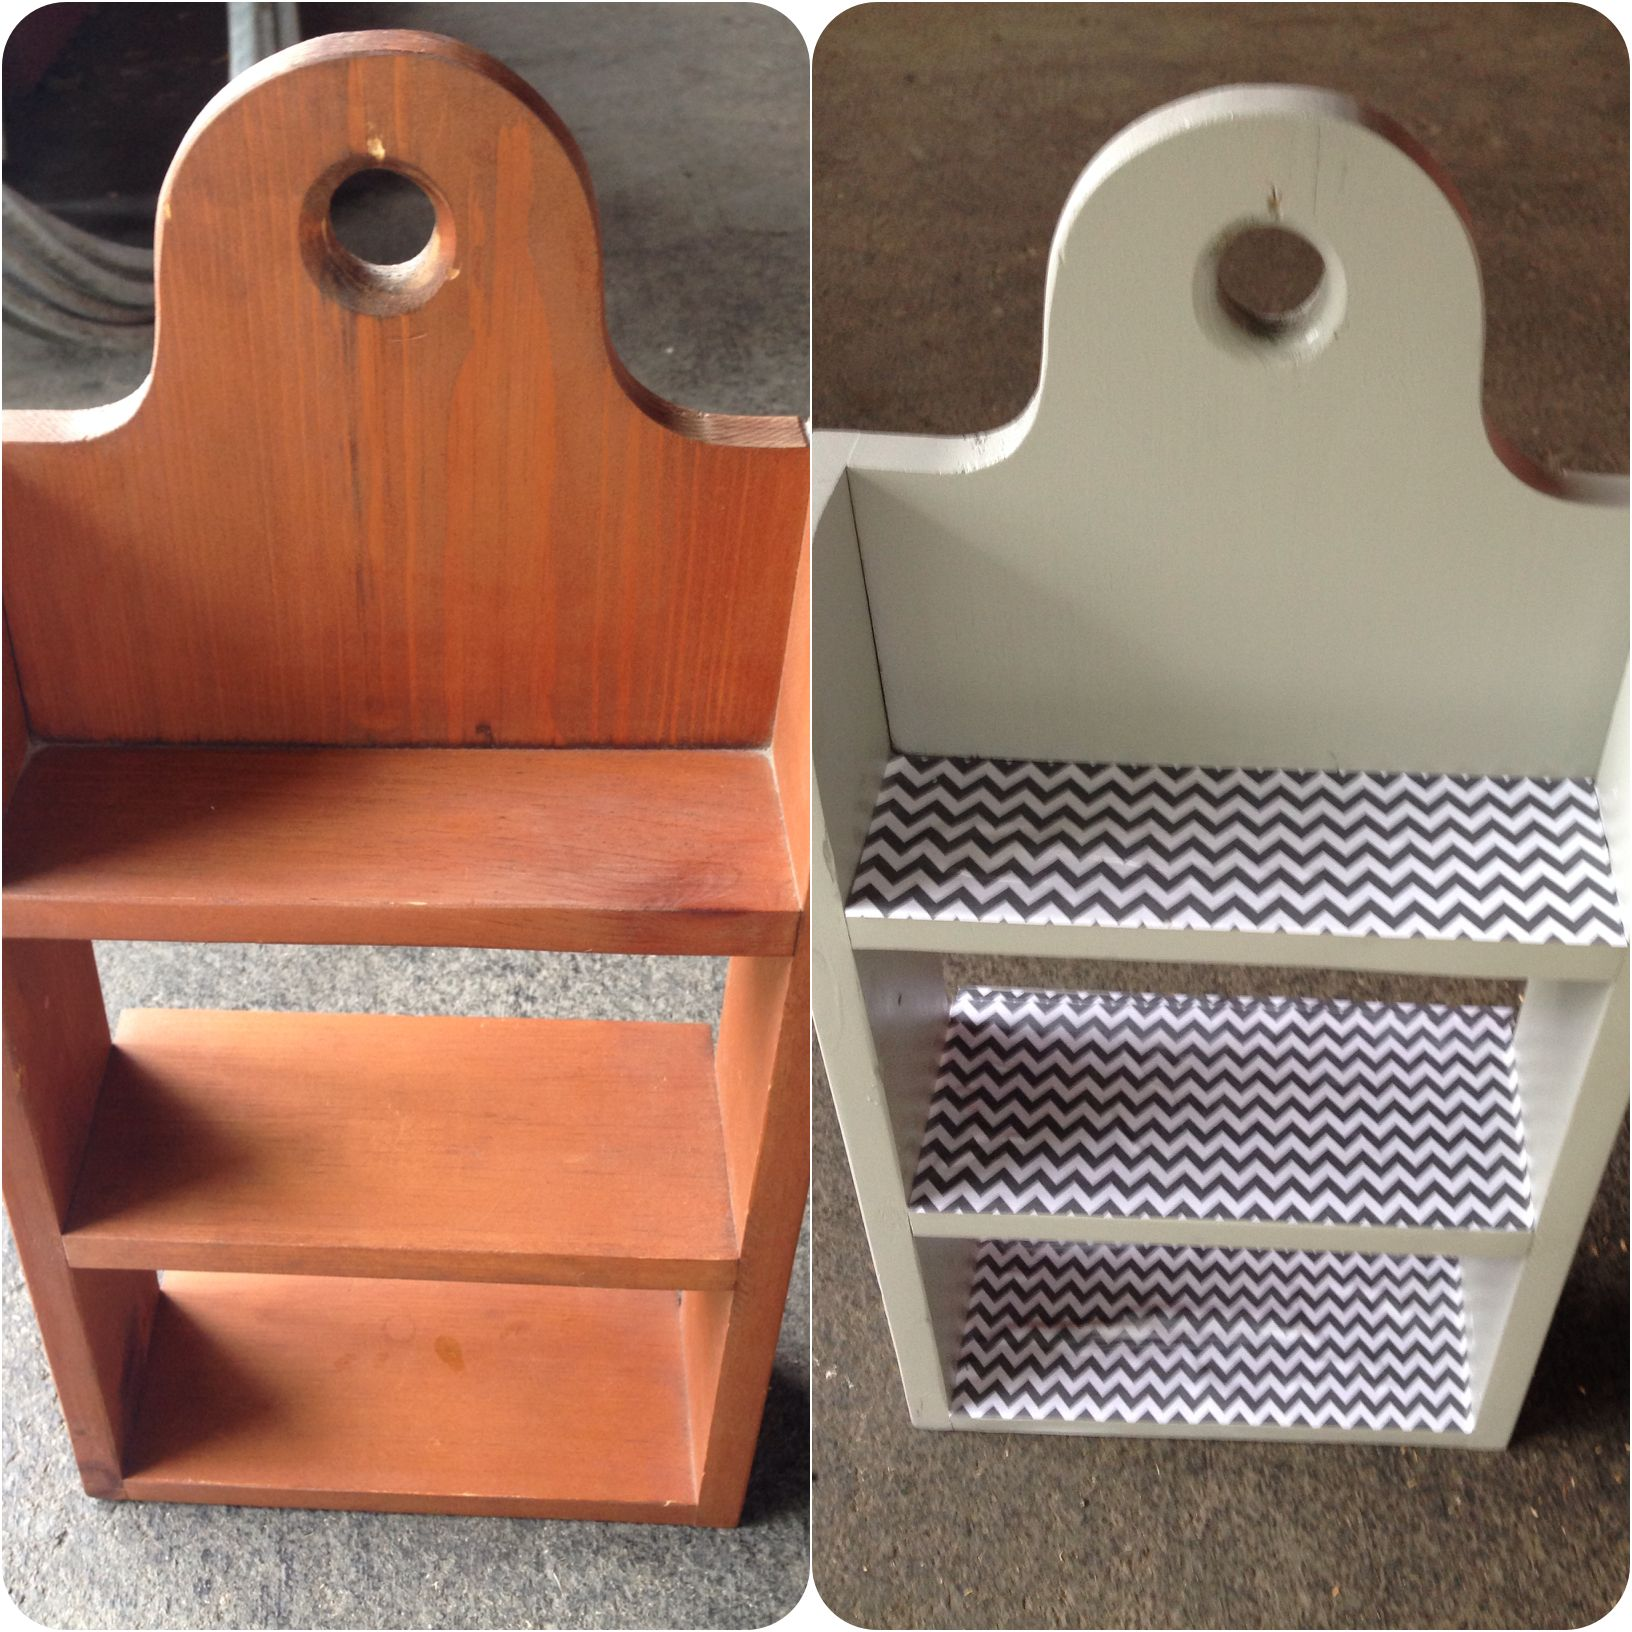 #crafting #refurbished #cheap